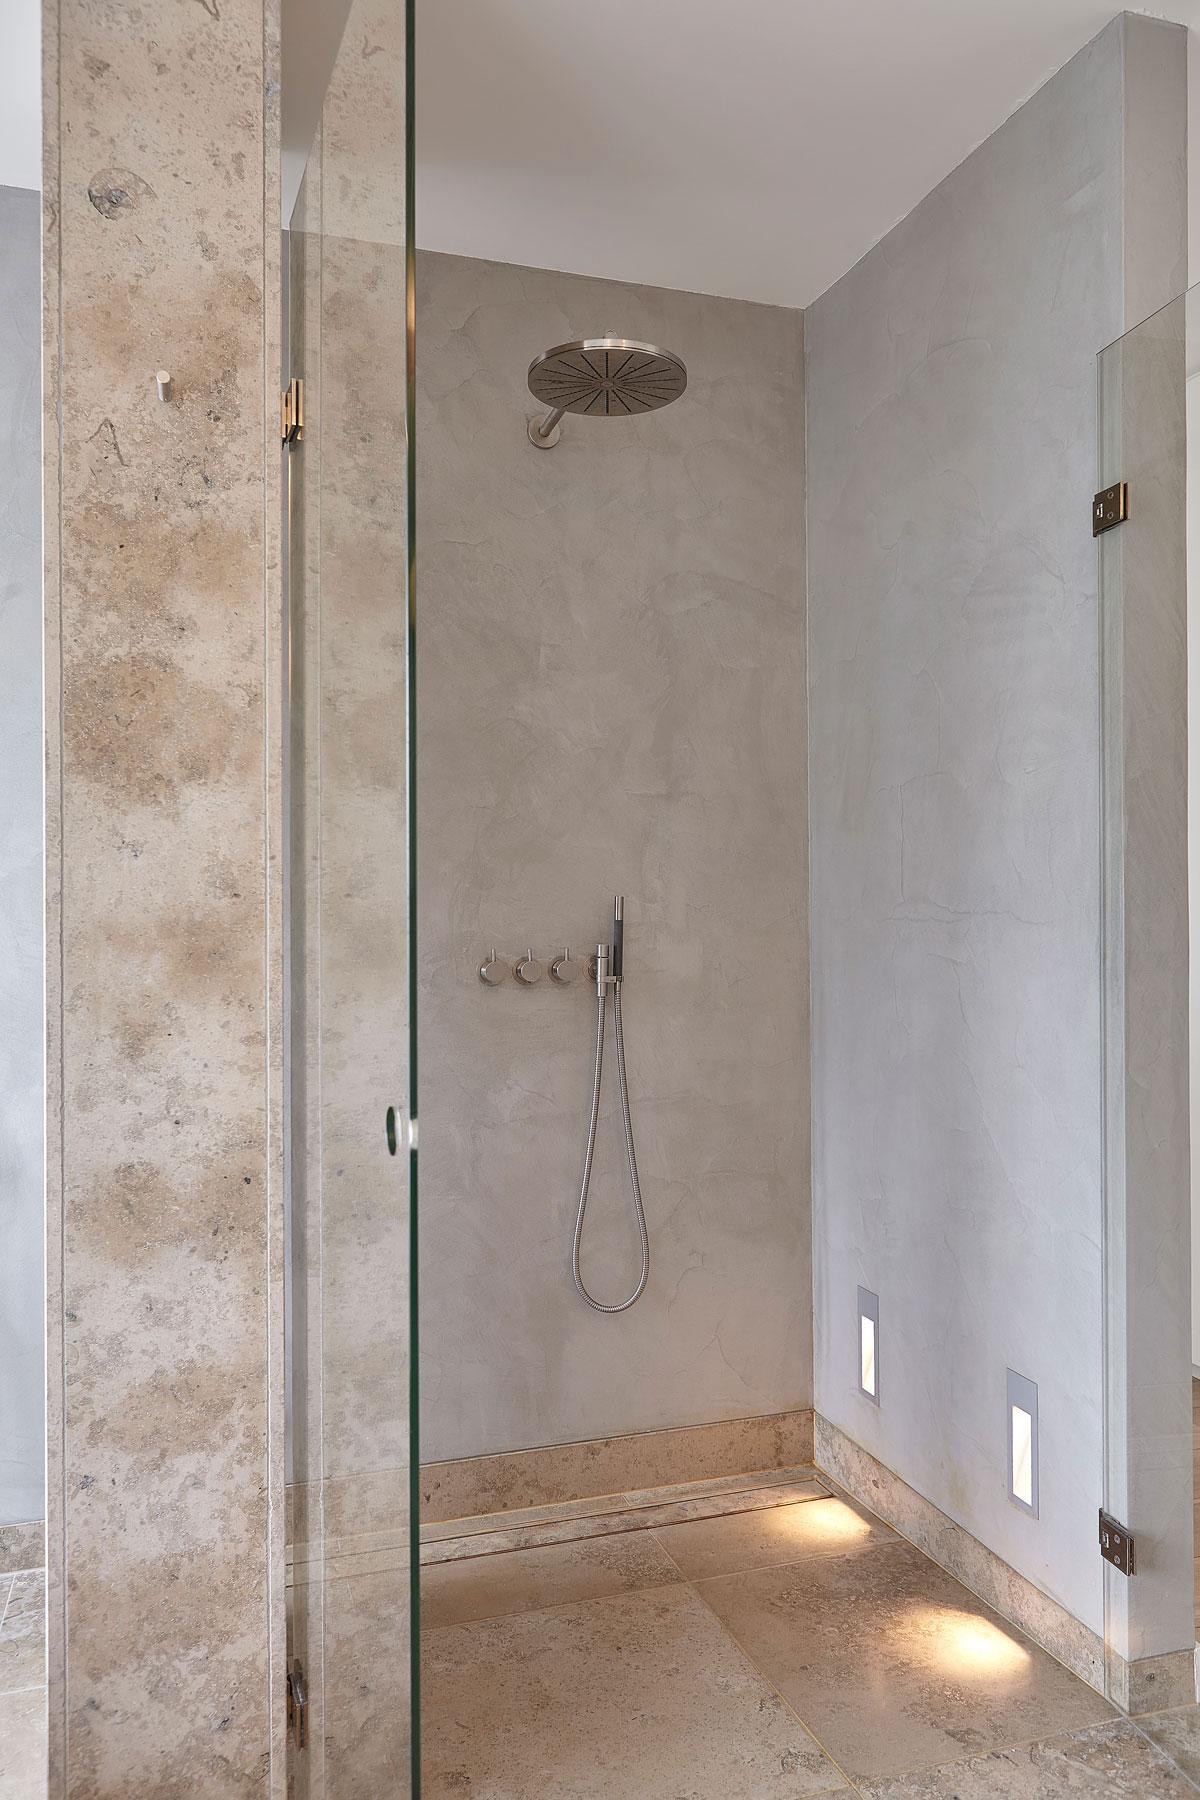 Badkamer, sanitair, inloopdouche, marmer, glazen wand, douche, regendouche, onderscheidende villa, Marco van Veldhuizen